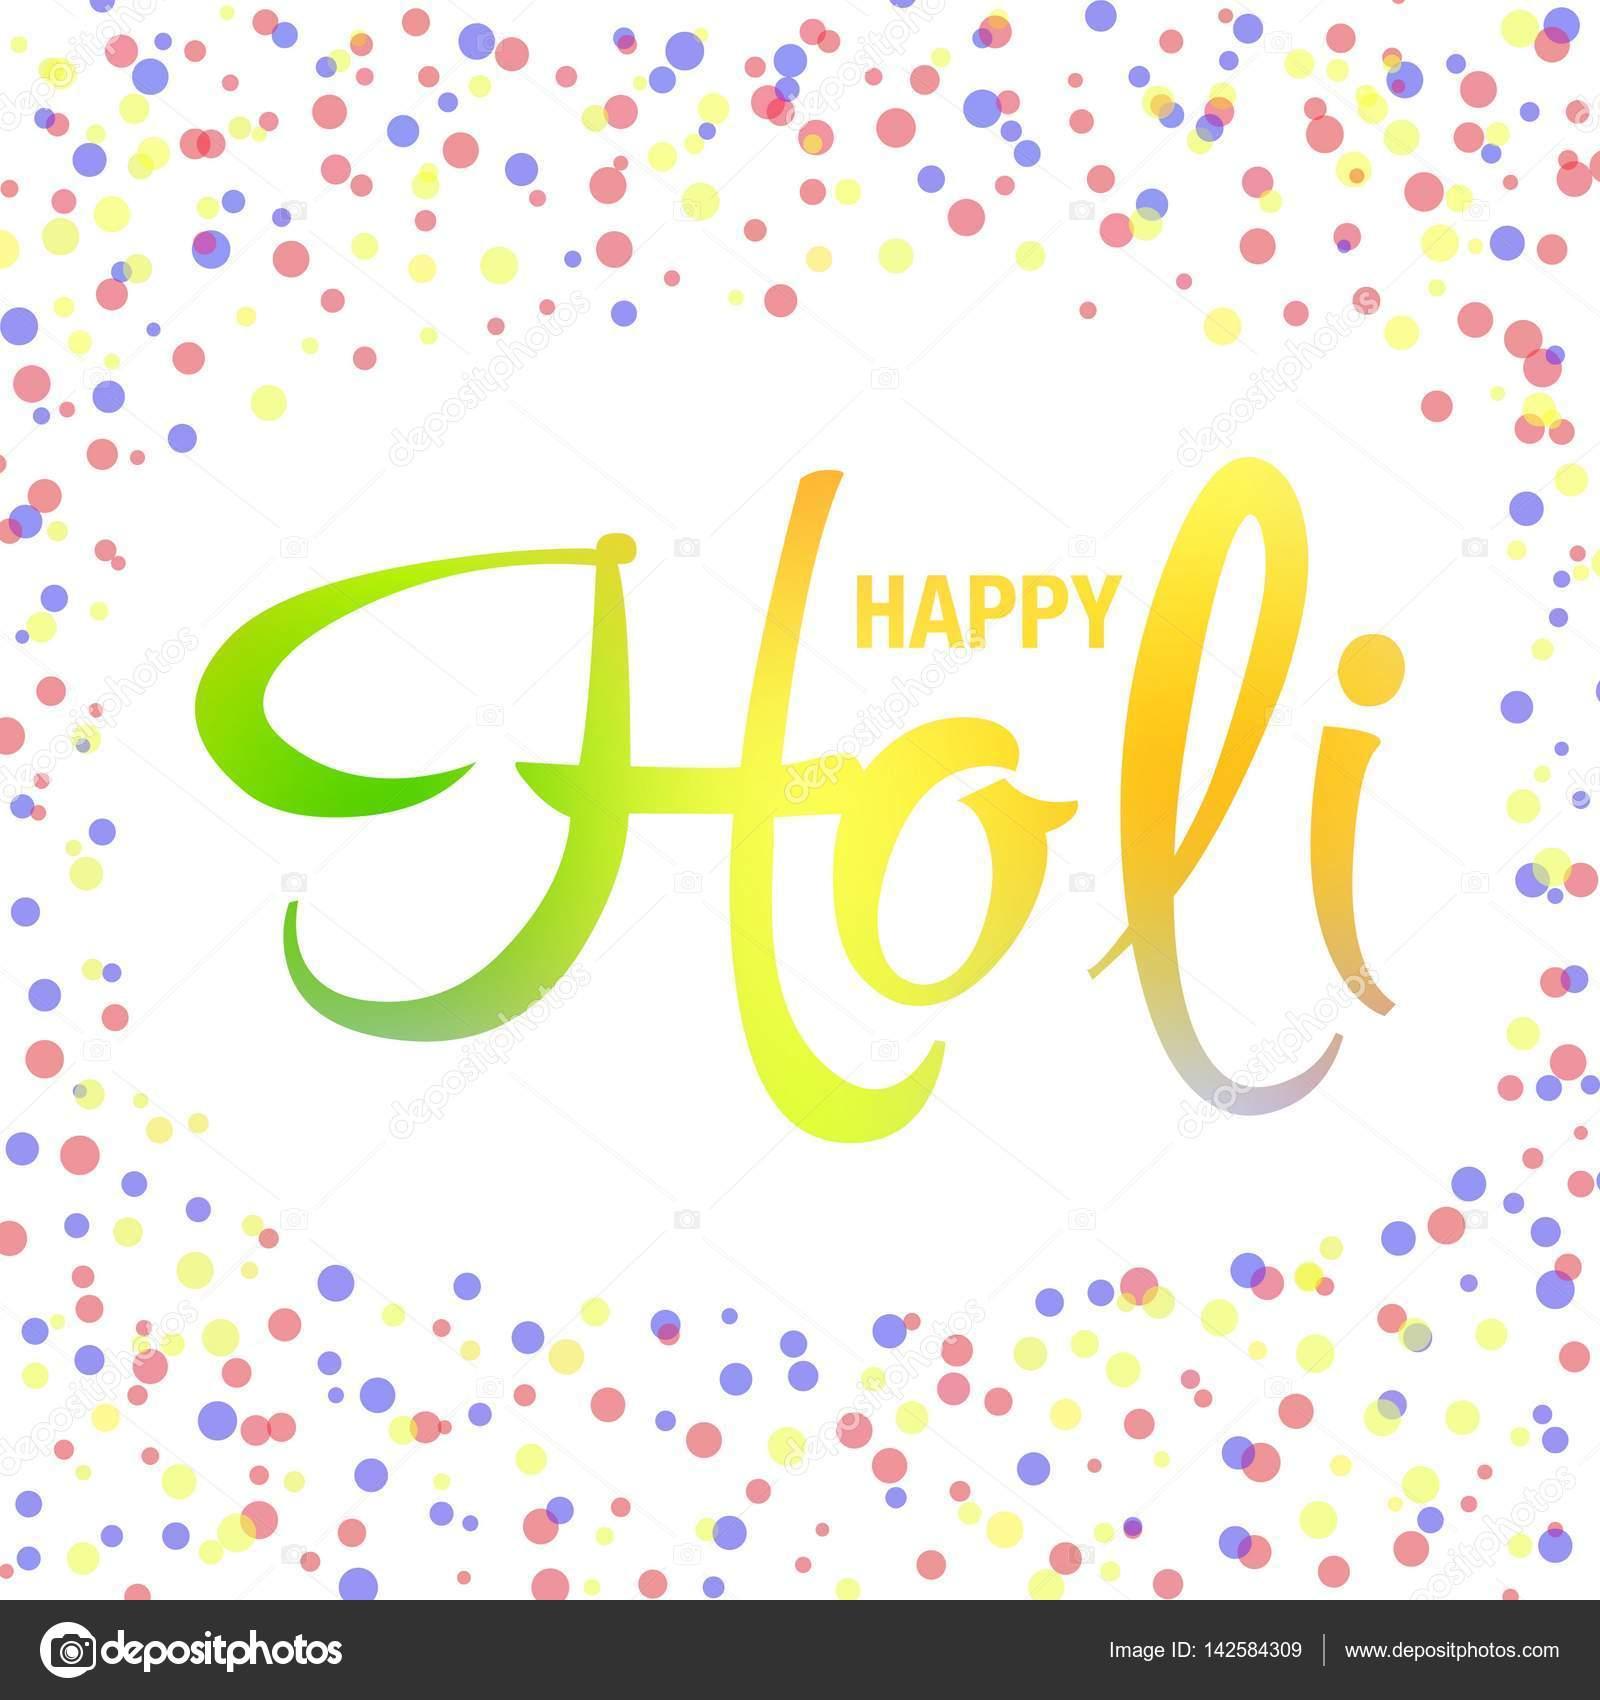 Happy holi greeting card stock vector nairi79 142584309 happy holi greeting card stock vector m4hsunfo